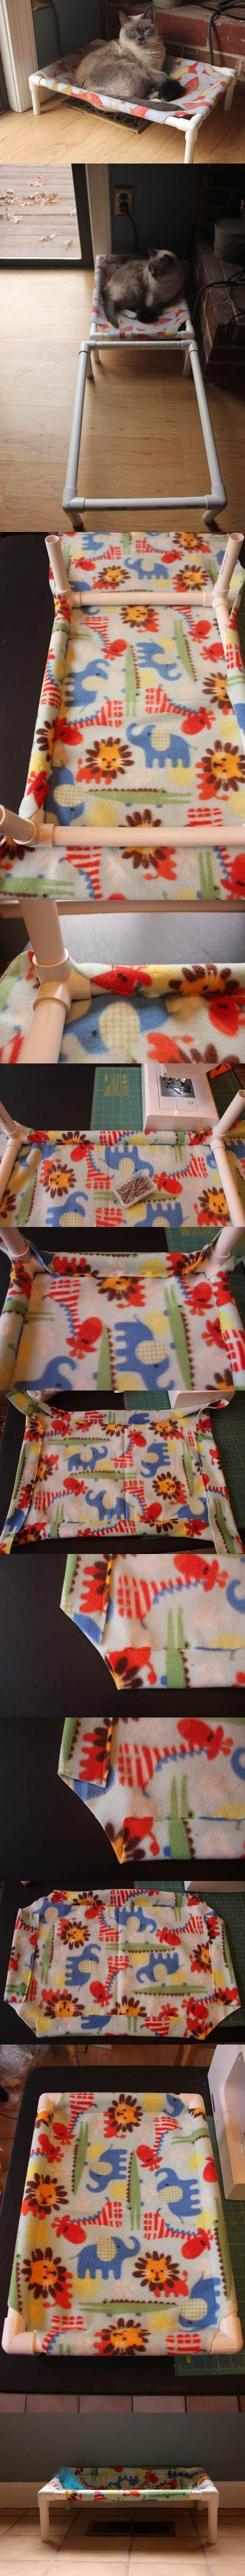 DIY PVC Pet Bed.